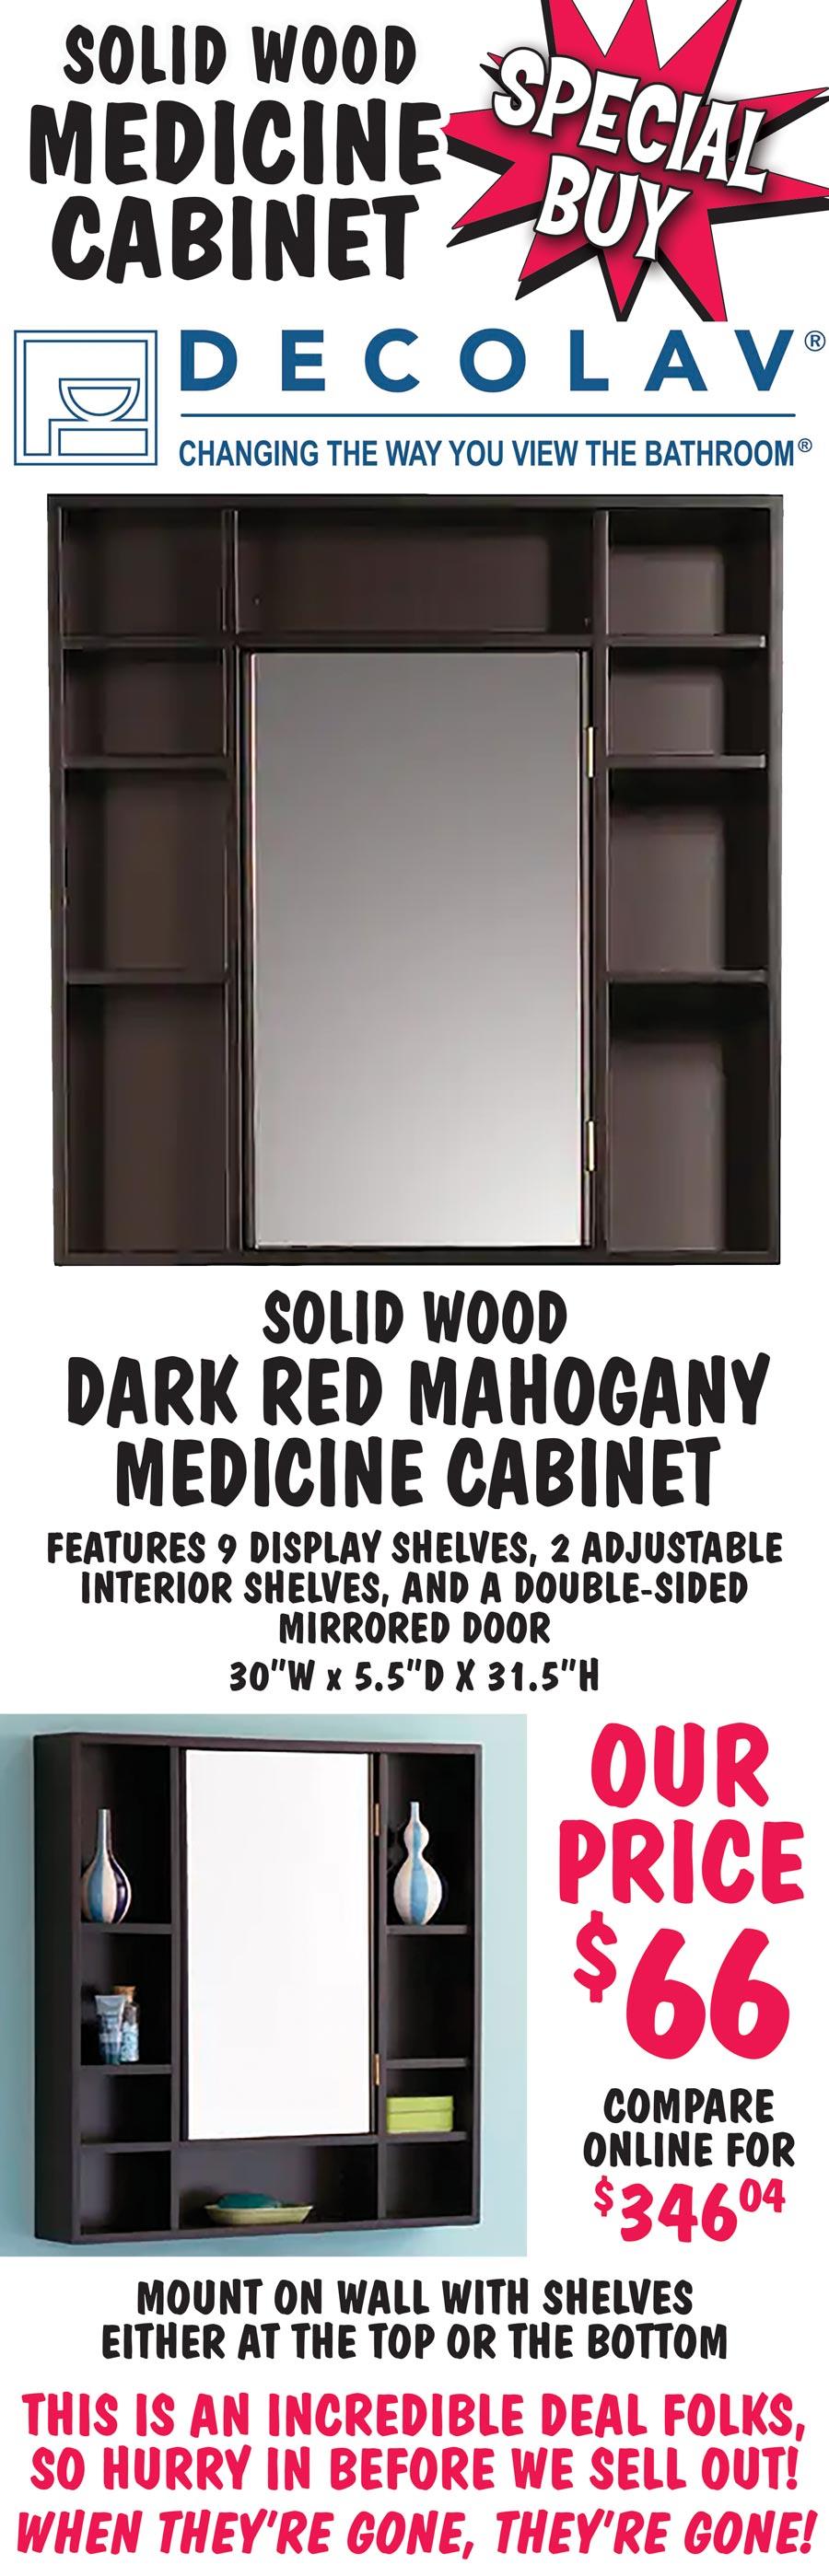 Solid Wood Medicine Cabinet - Special Buy $66 - Dark Red Mahogany Finish